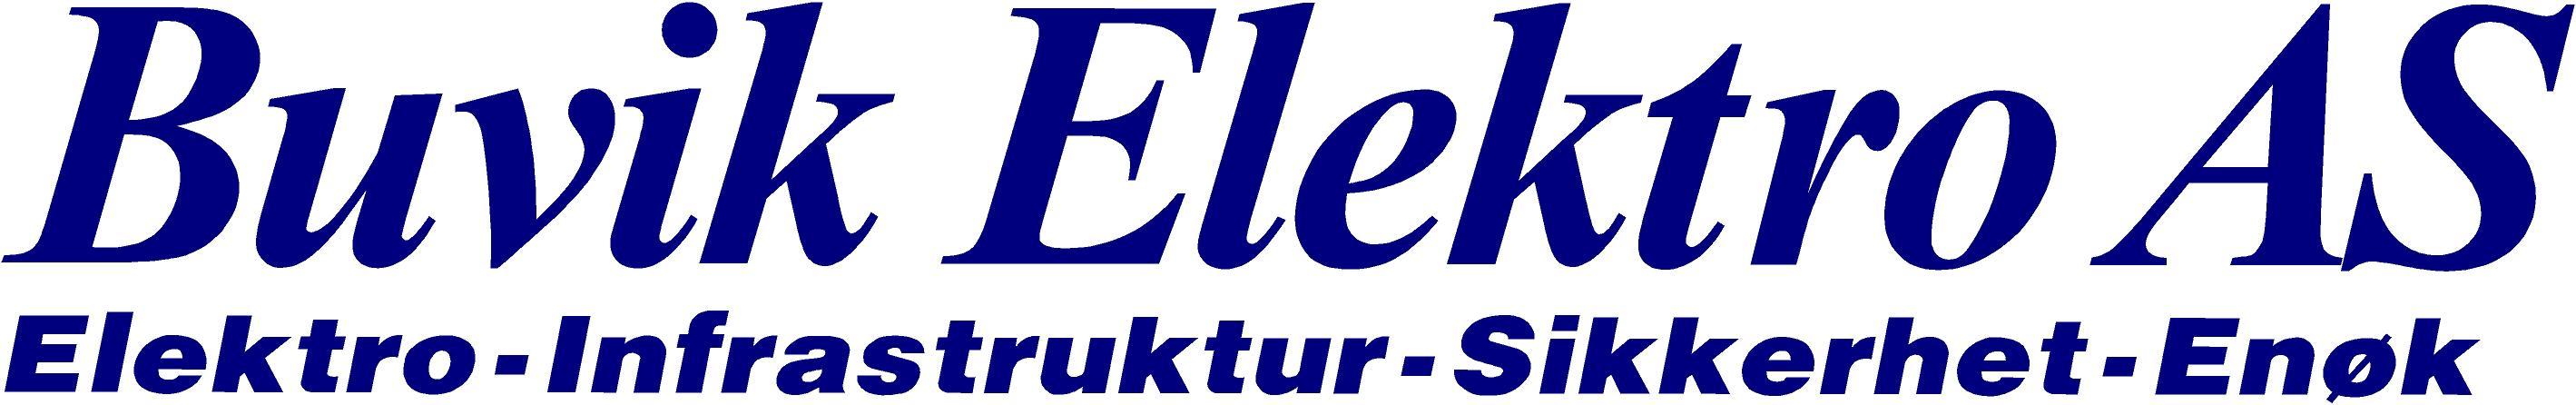 www.buvik.no